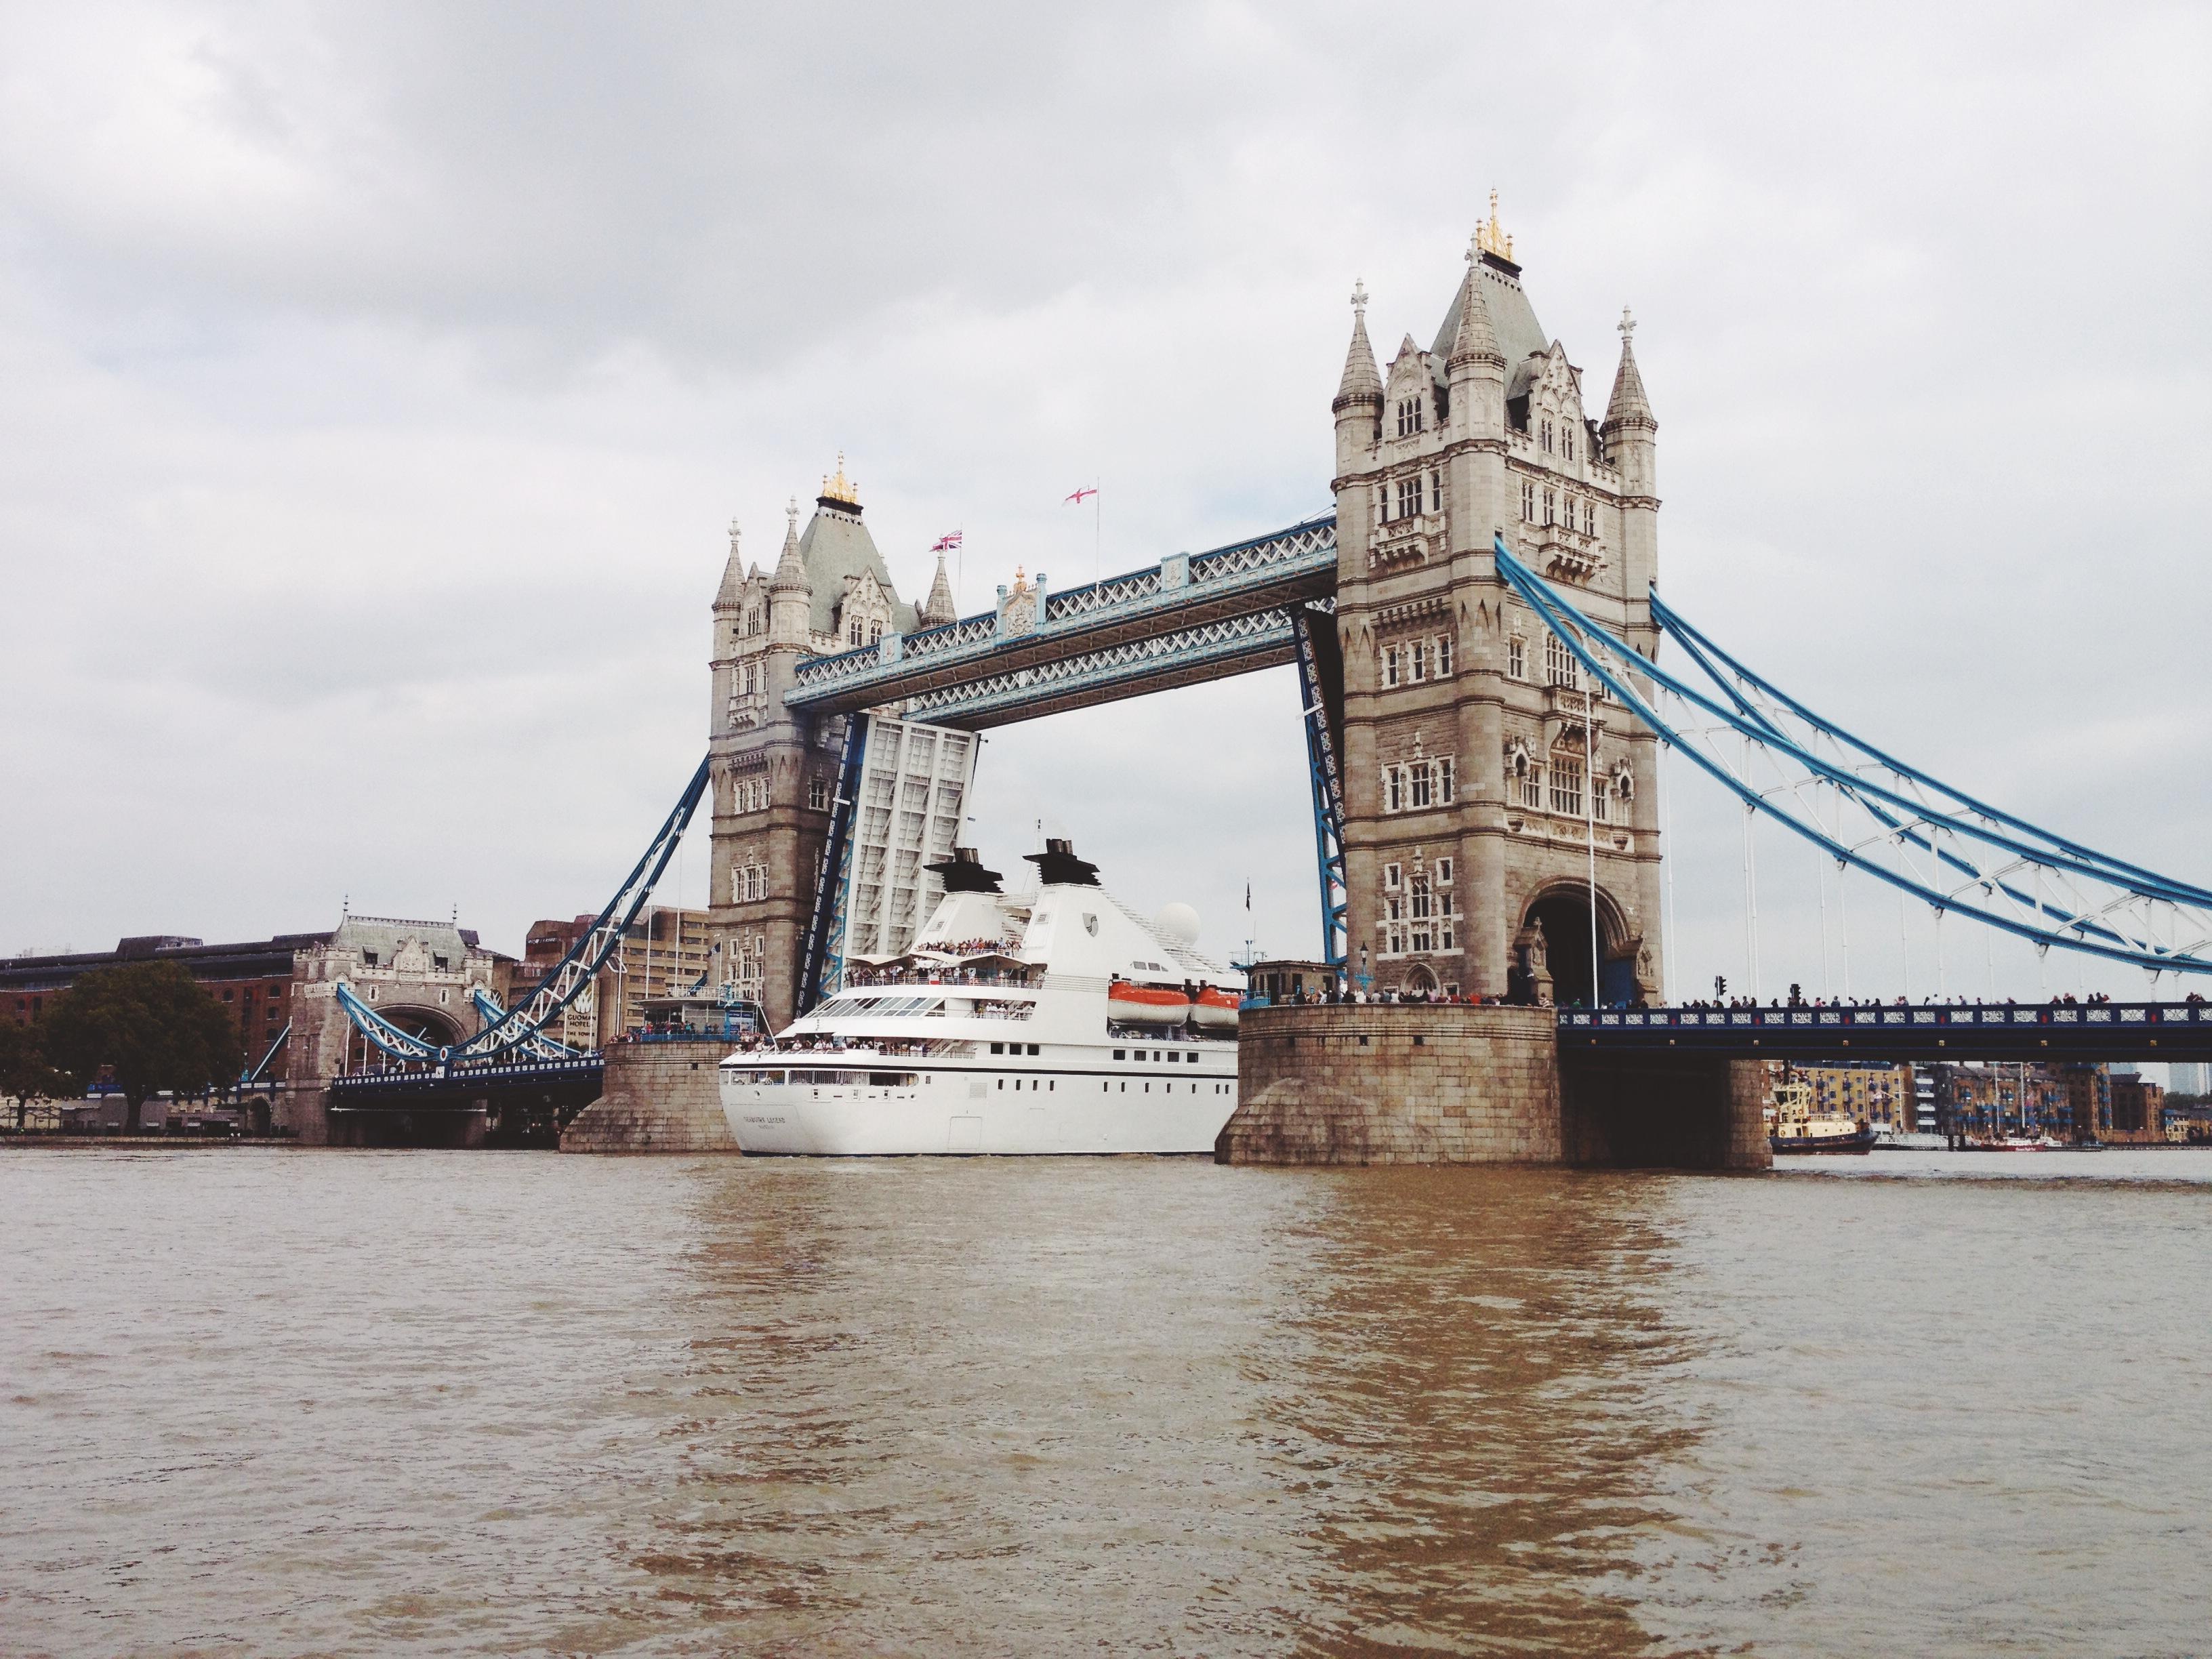 River Thames, Architecture, Boat, Bridge, Building, HQ Photo